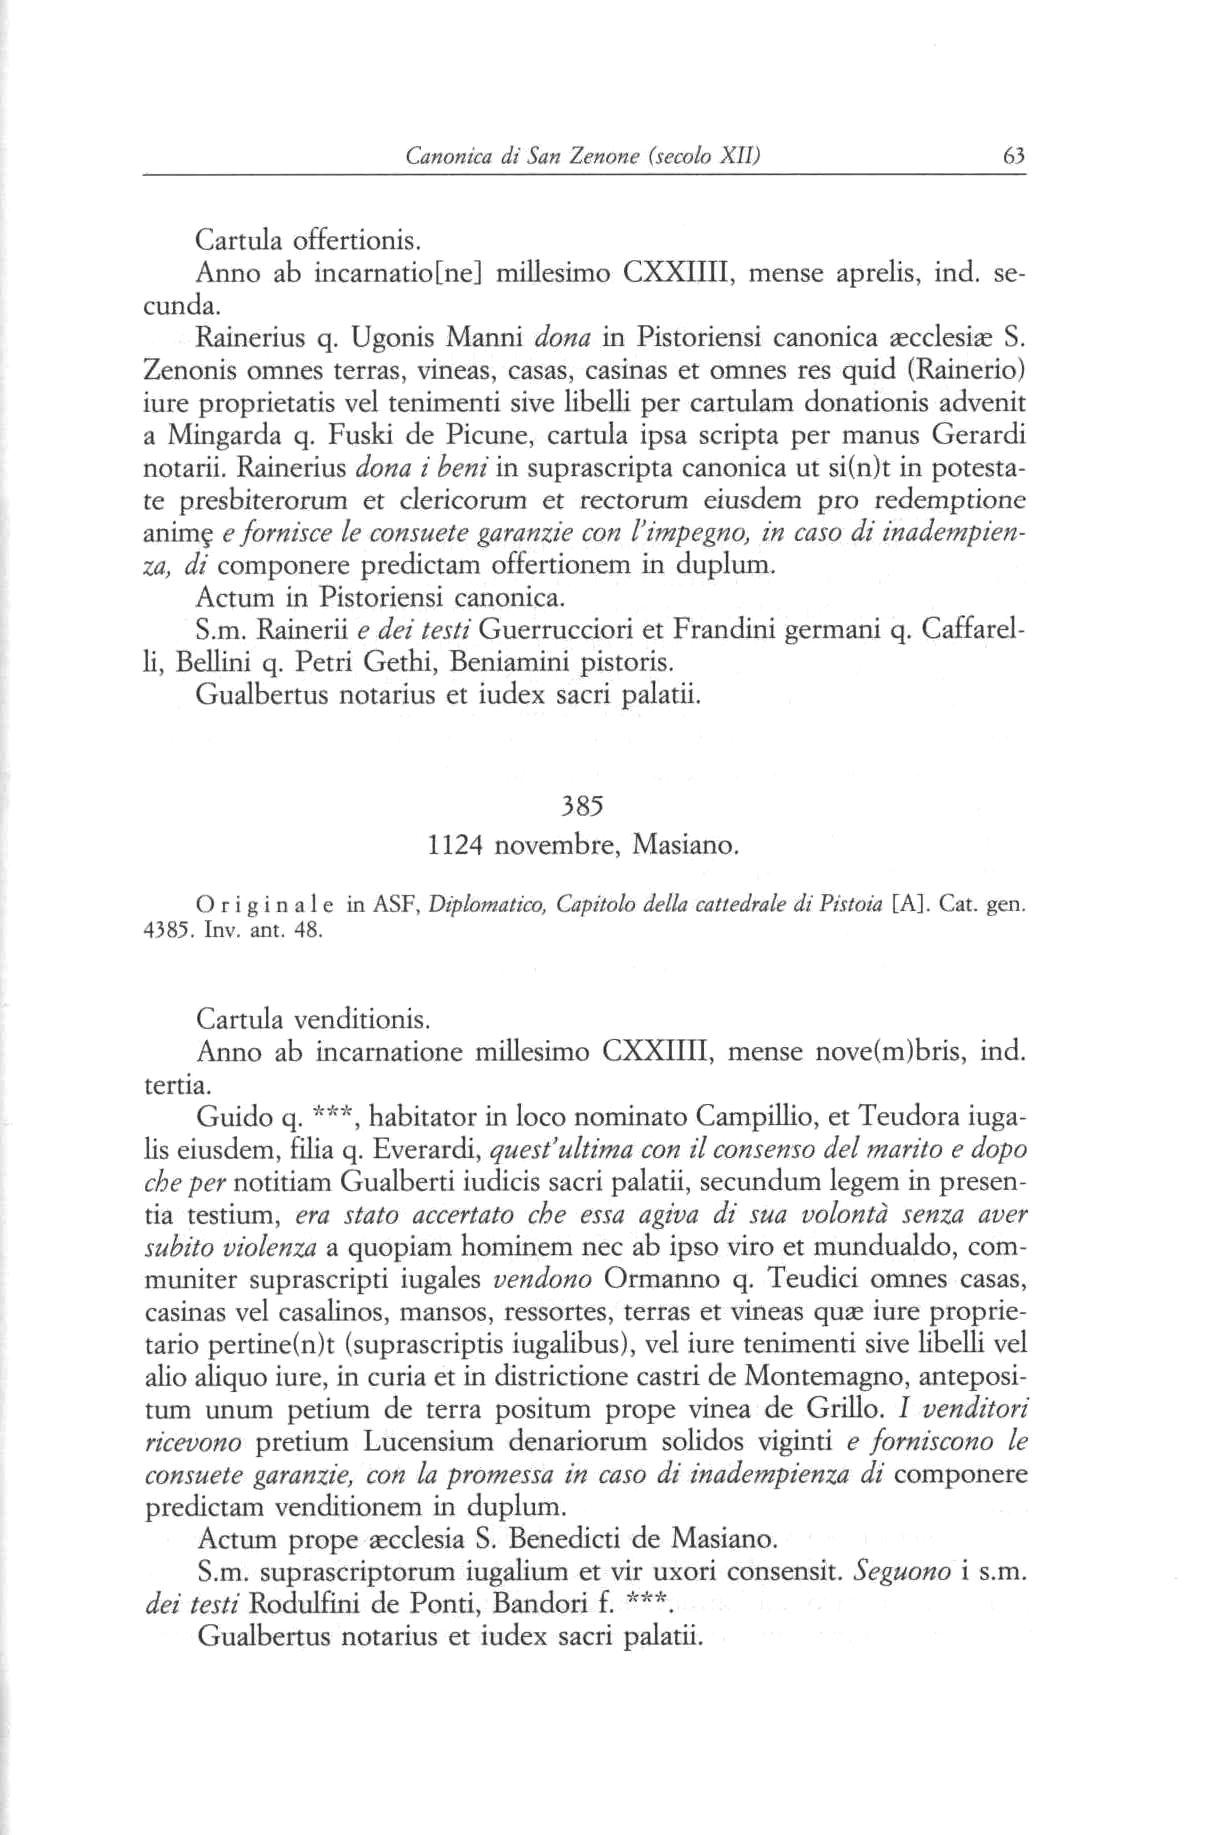 Canonica S. Zenone XII 0063.jpg